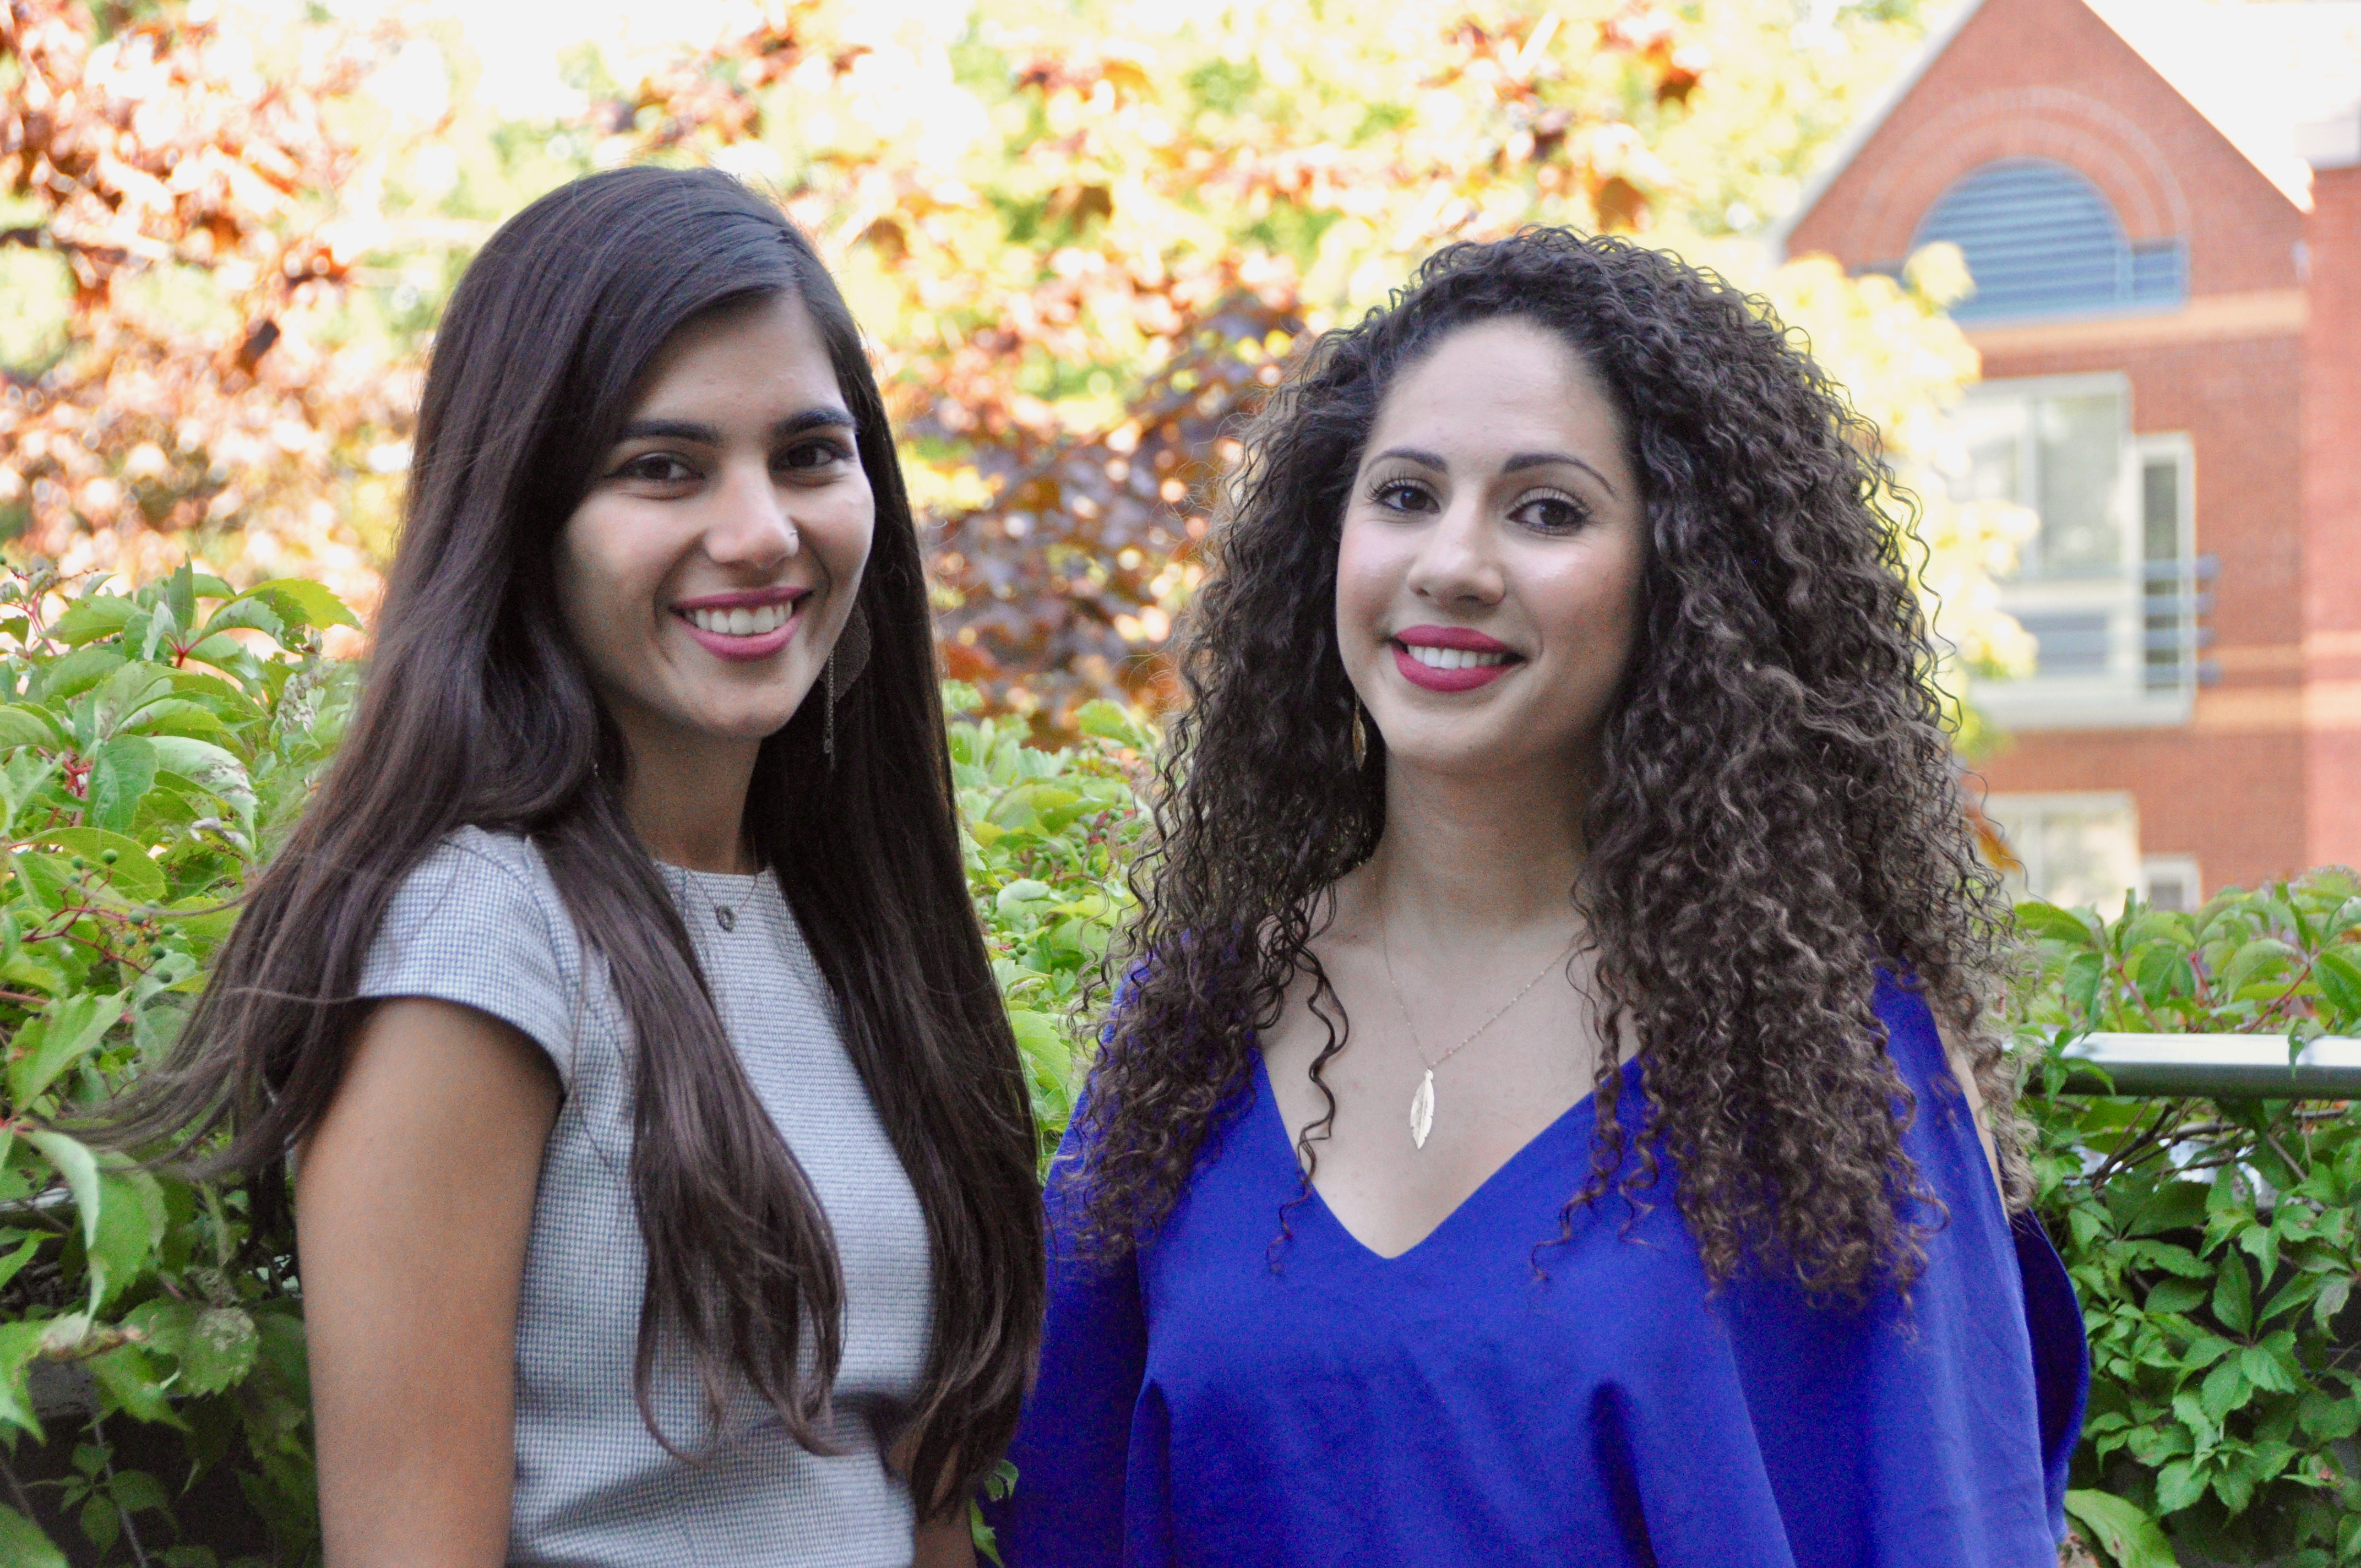 Sidra Sashmi and Amira Maameri